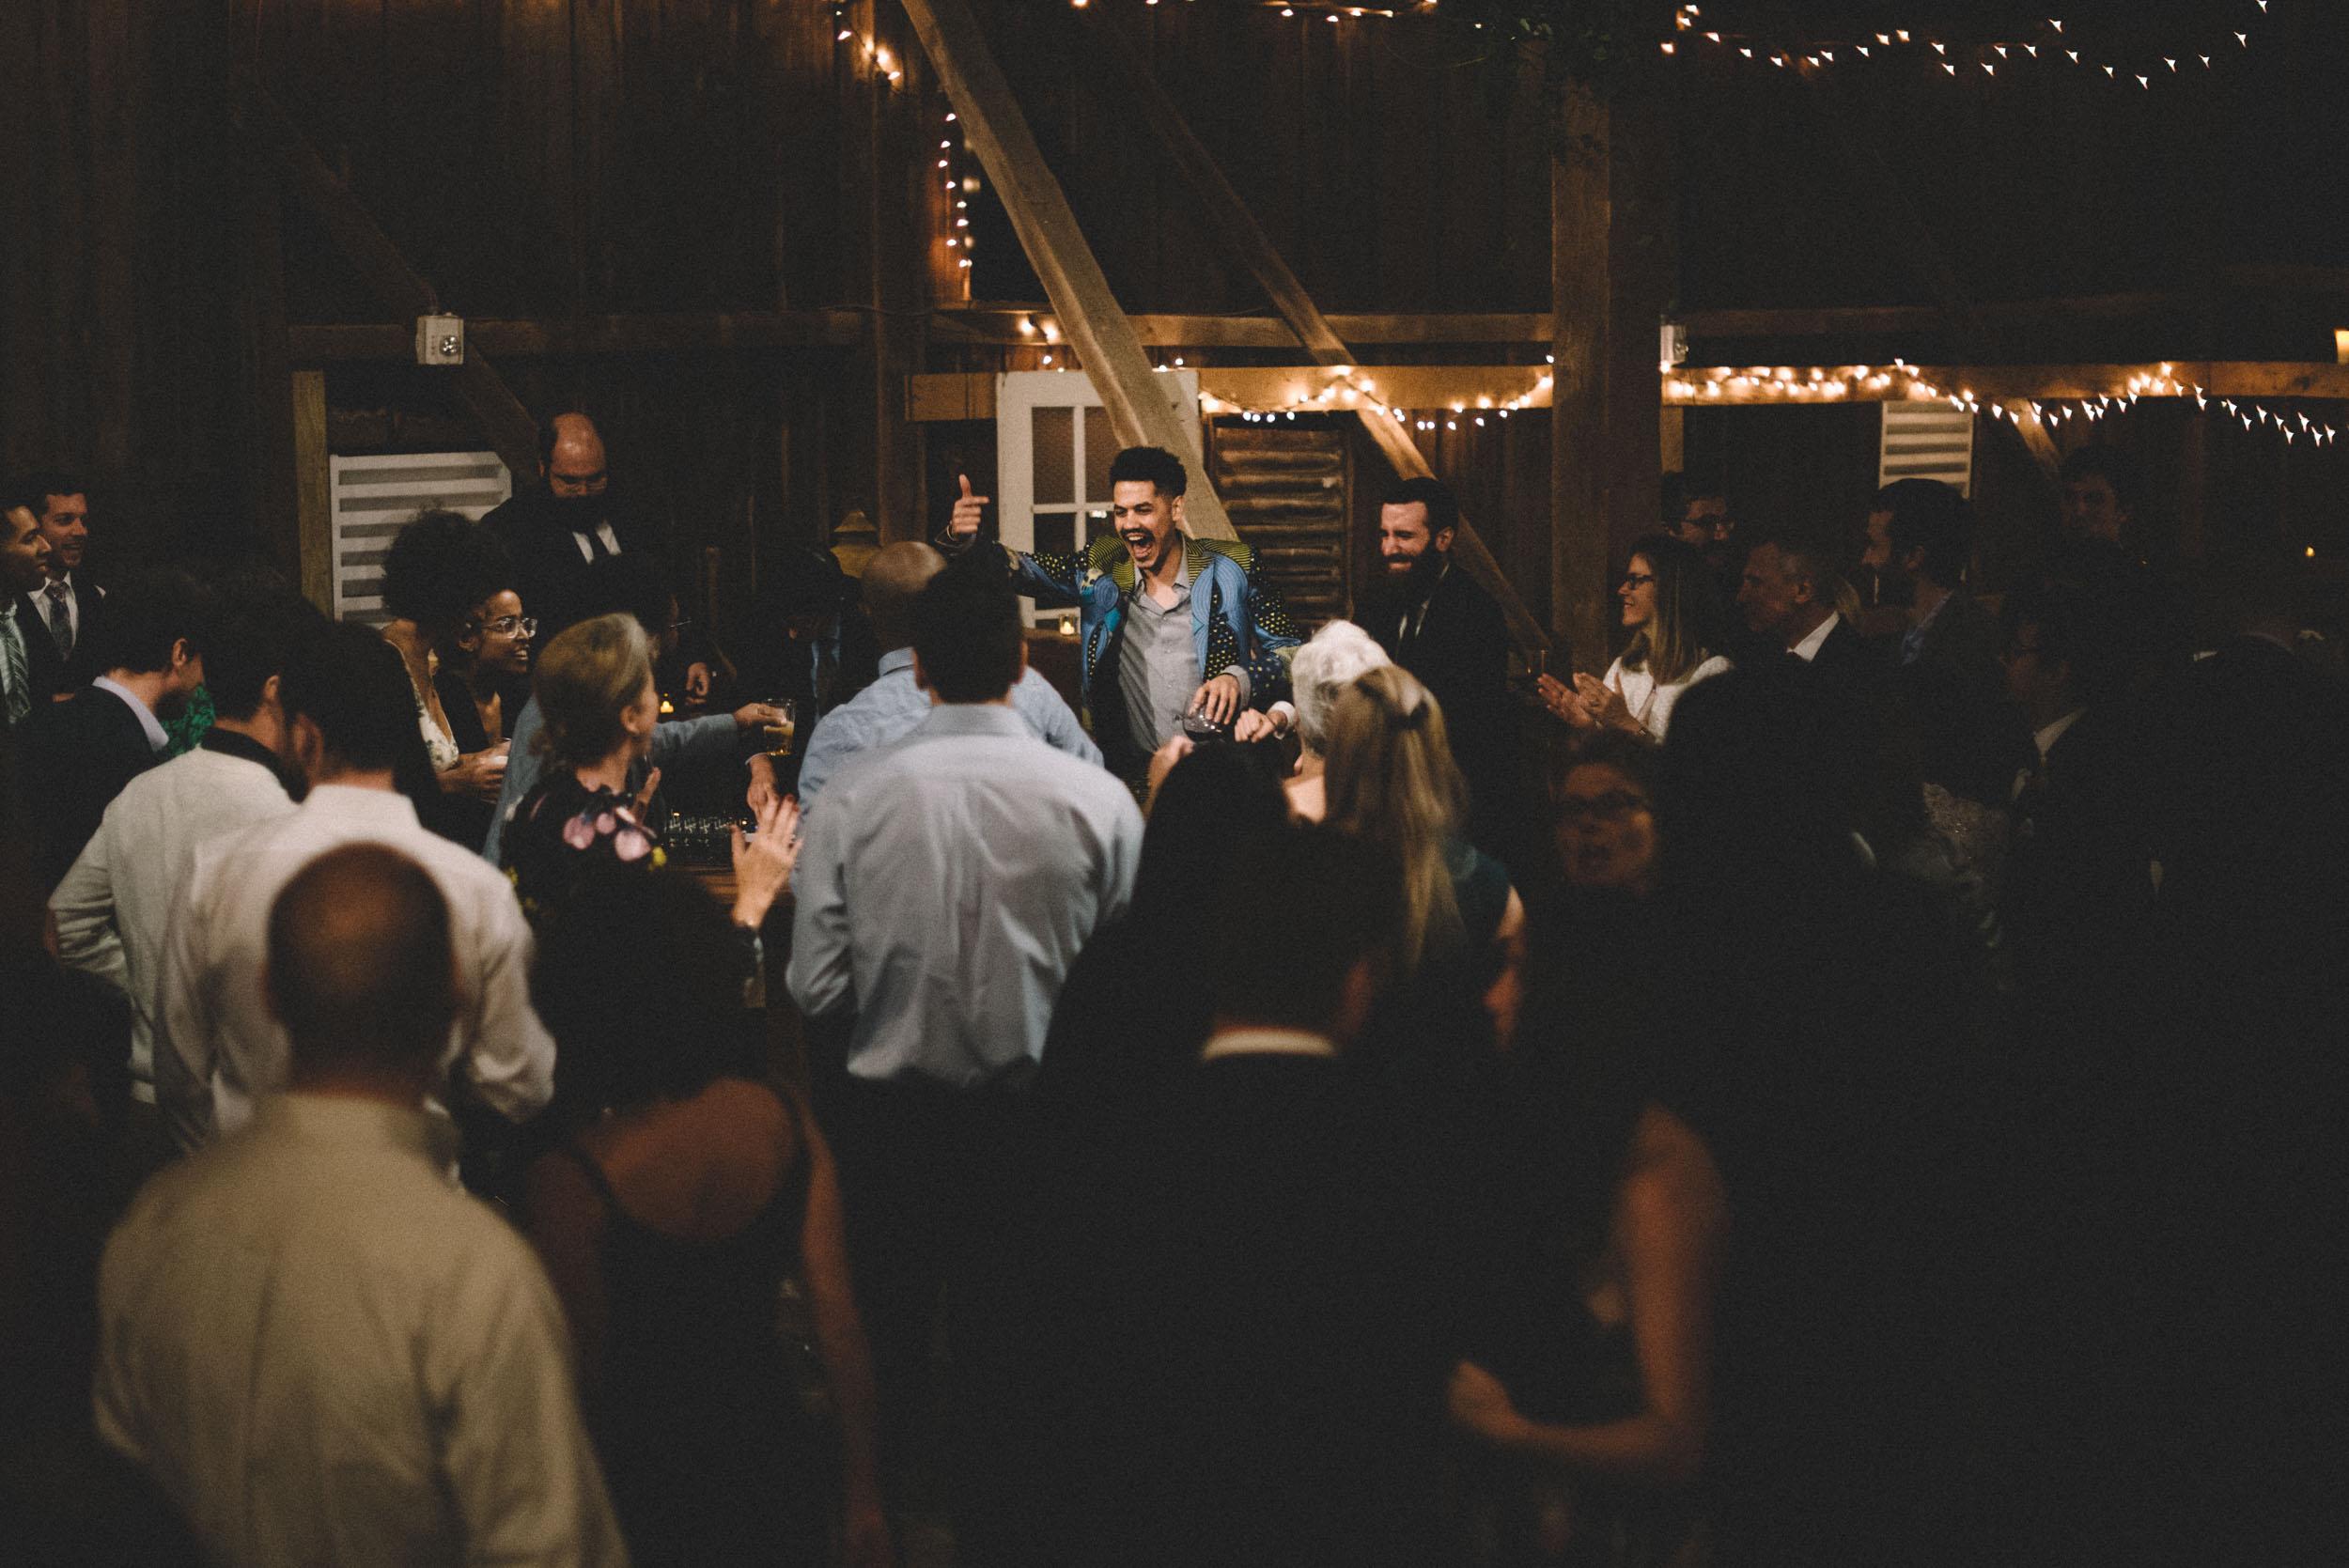 poolseville-maryland-wedding-photographer-79.jpg